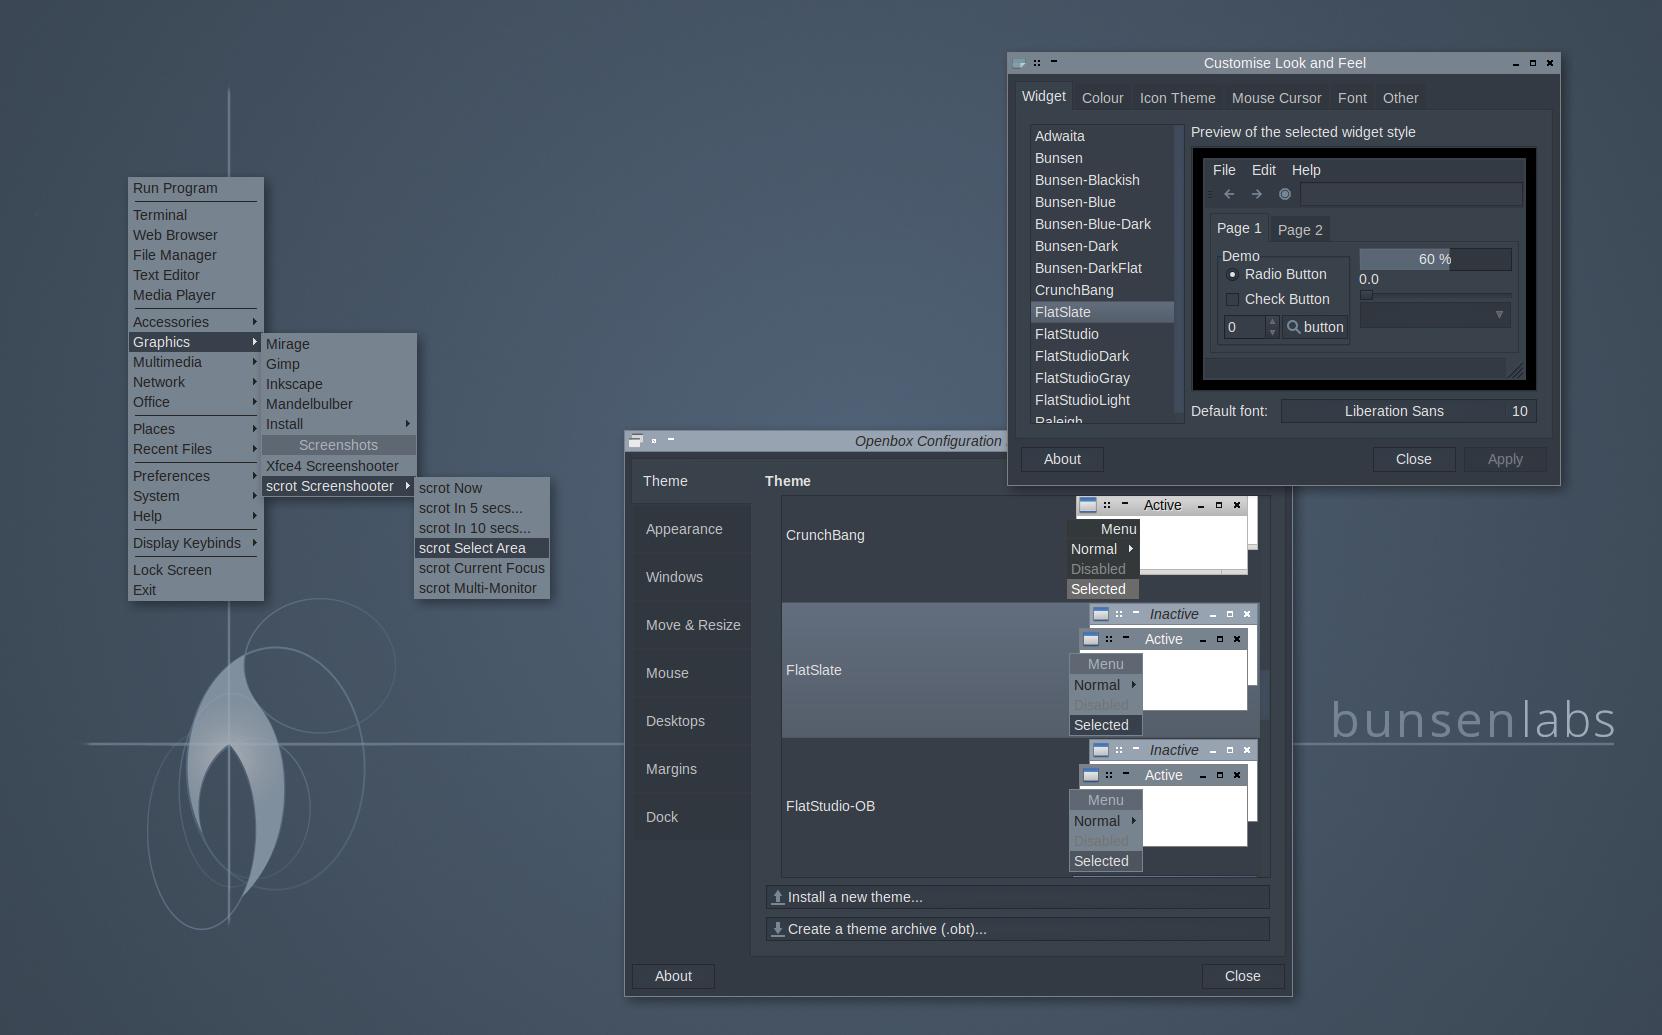 FlatSlate Openbox/GTK theme by capn-damo